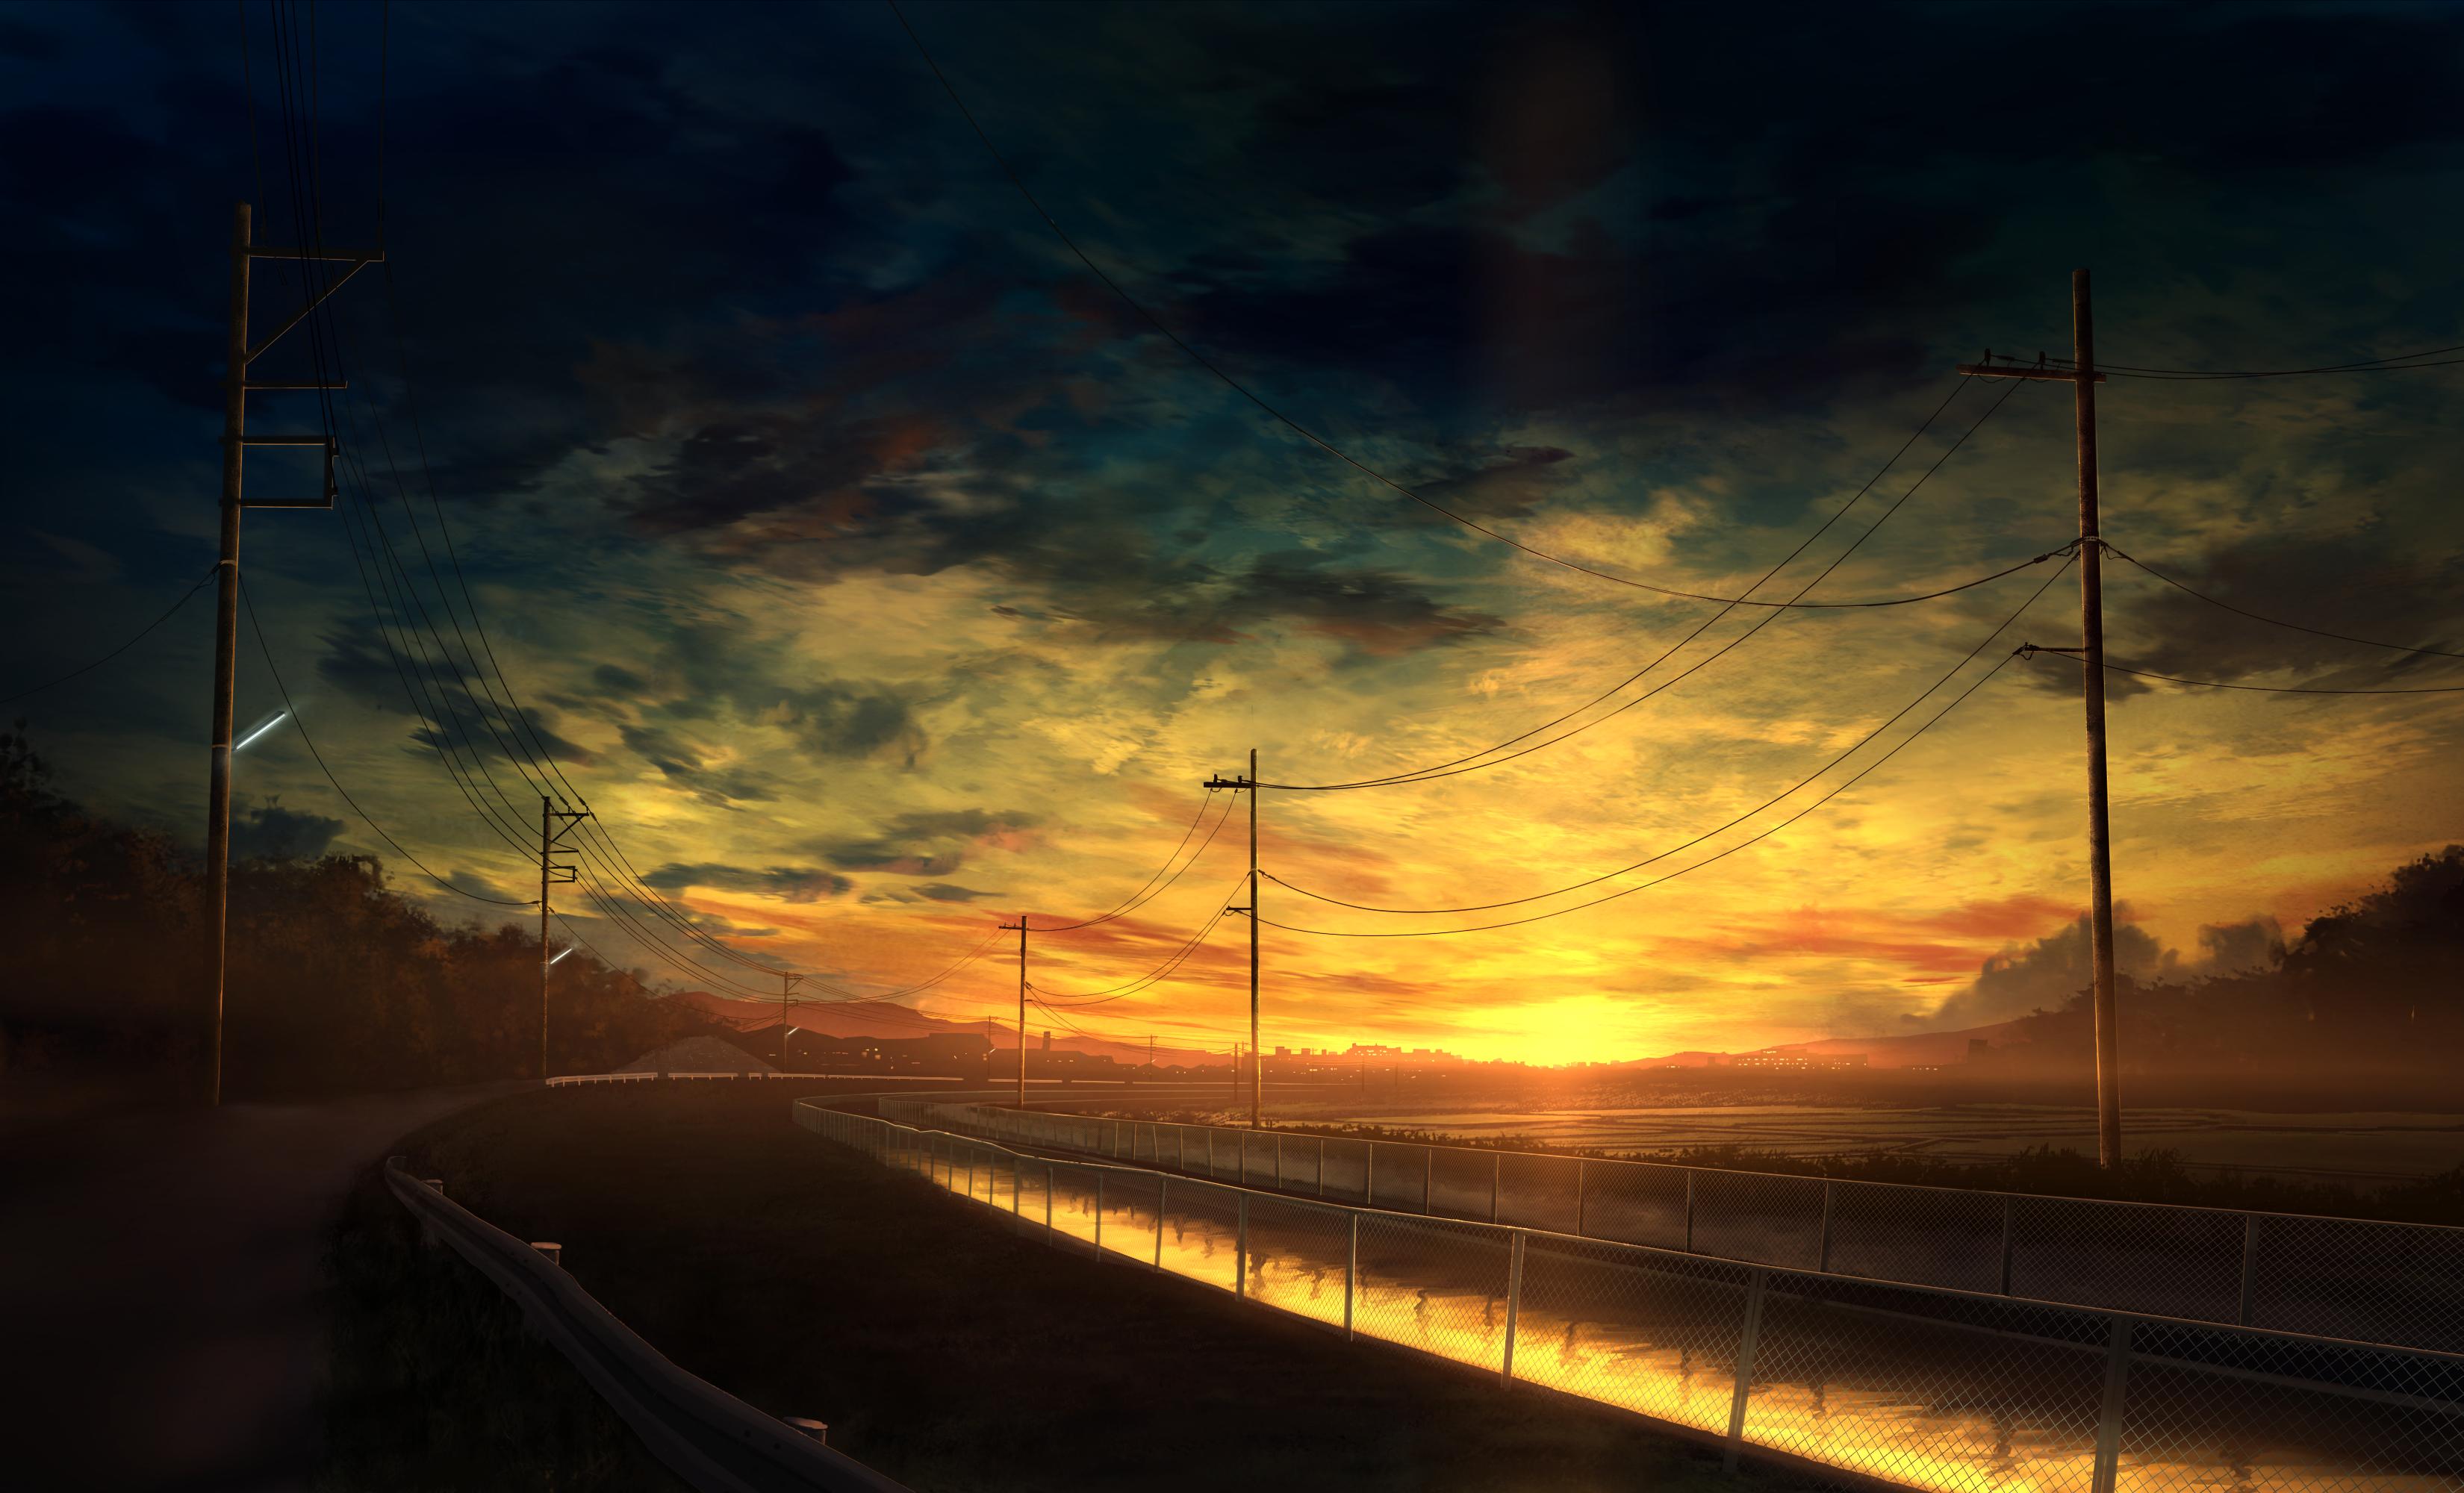 Anime 3300x2000 sunset road Por do sol, Imagine, Cores